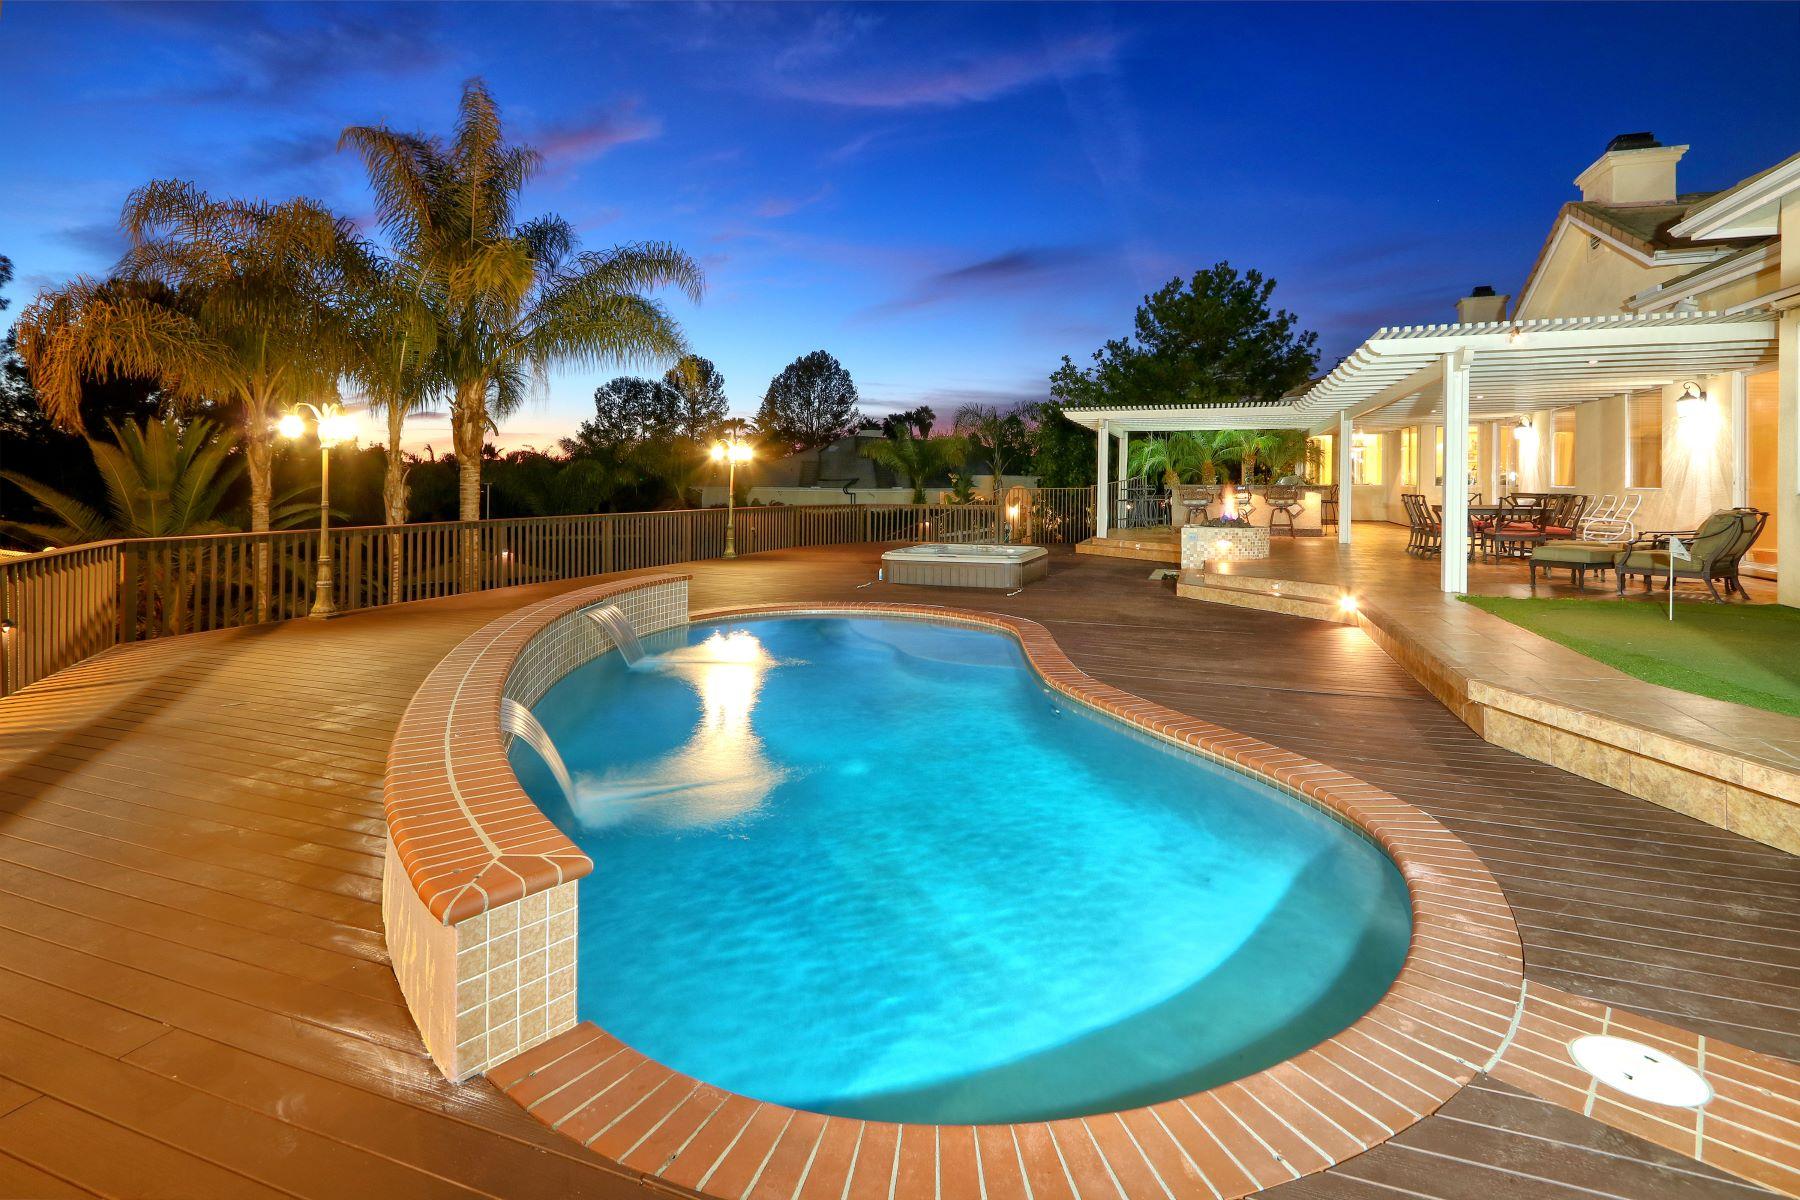 Single Family Home for Active at Carriage Estates 17035 Edina Court Poway, California 92064 United States